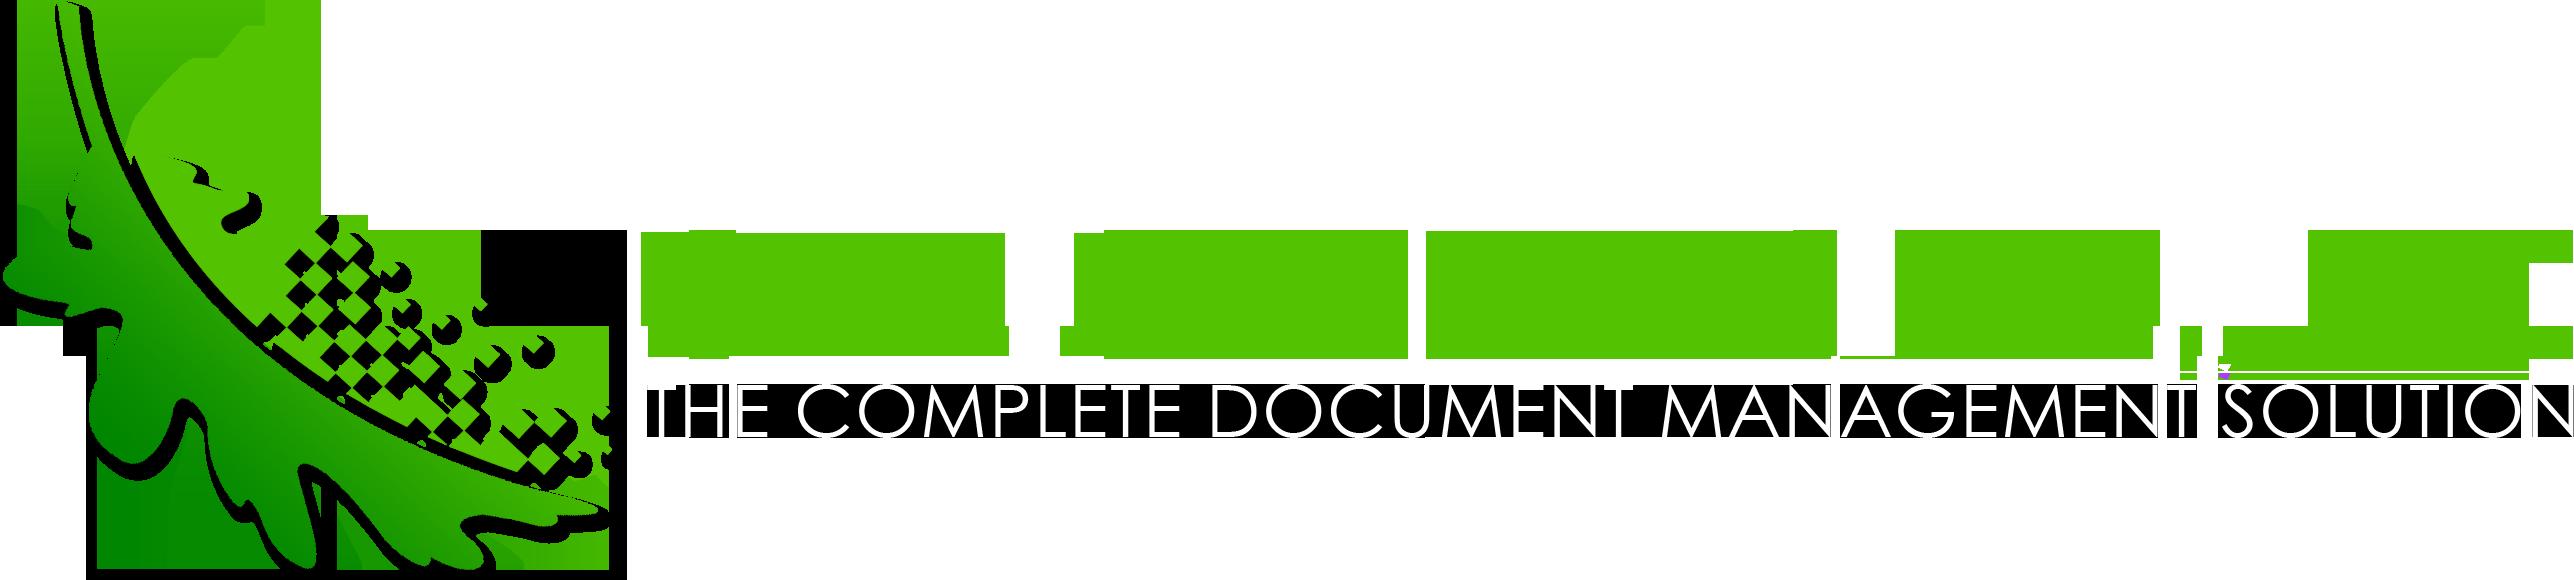 CBM Archives CO., LLC